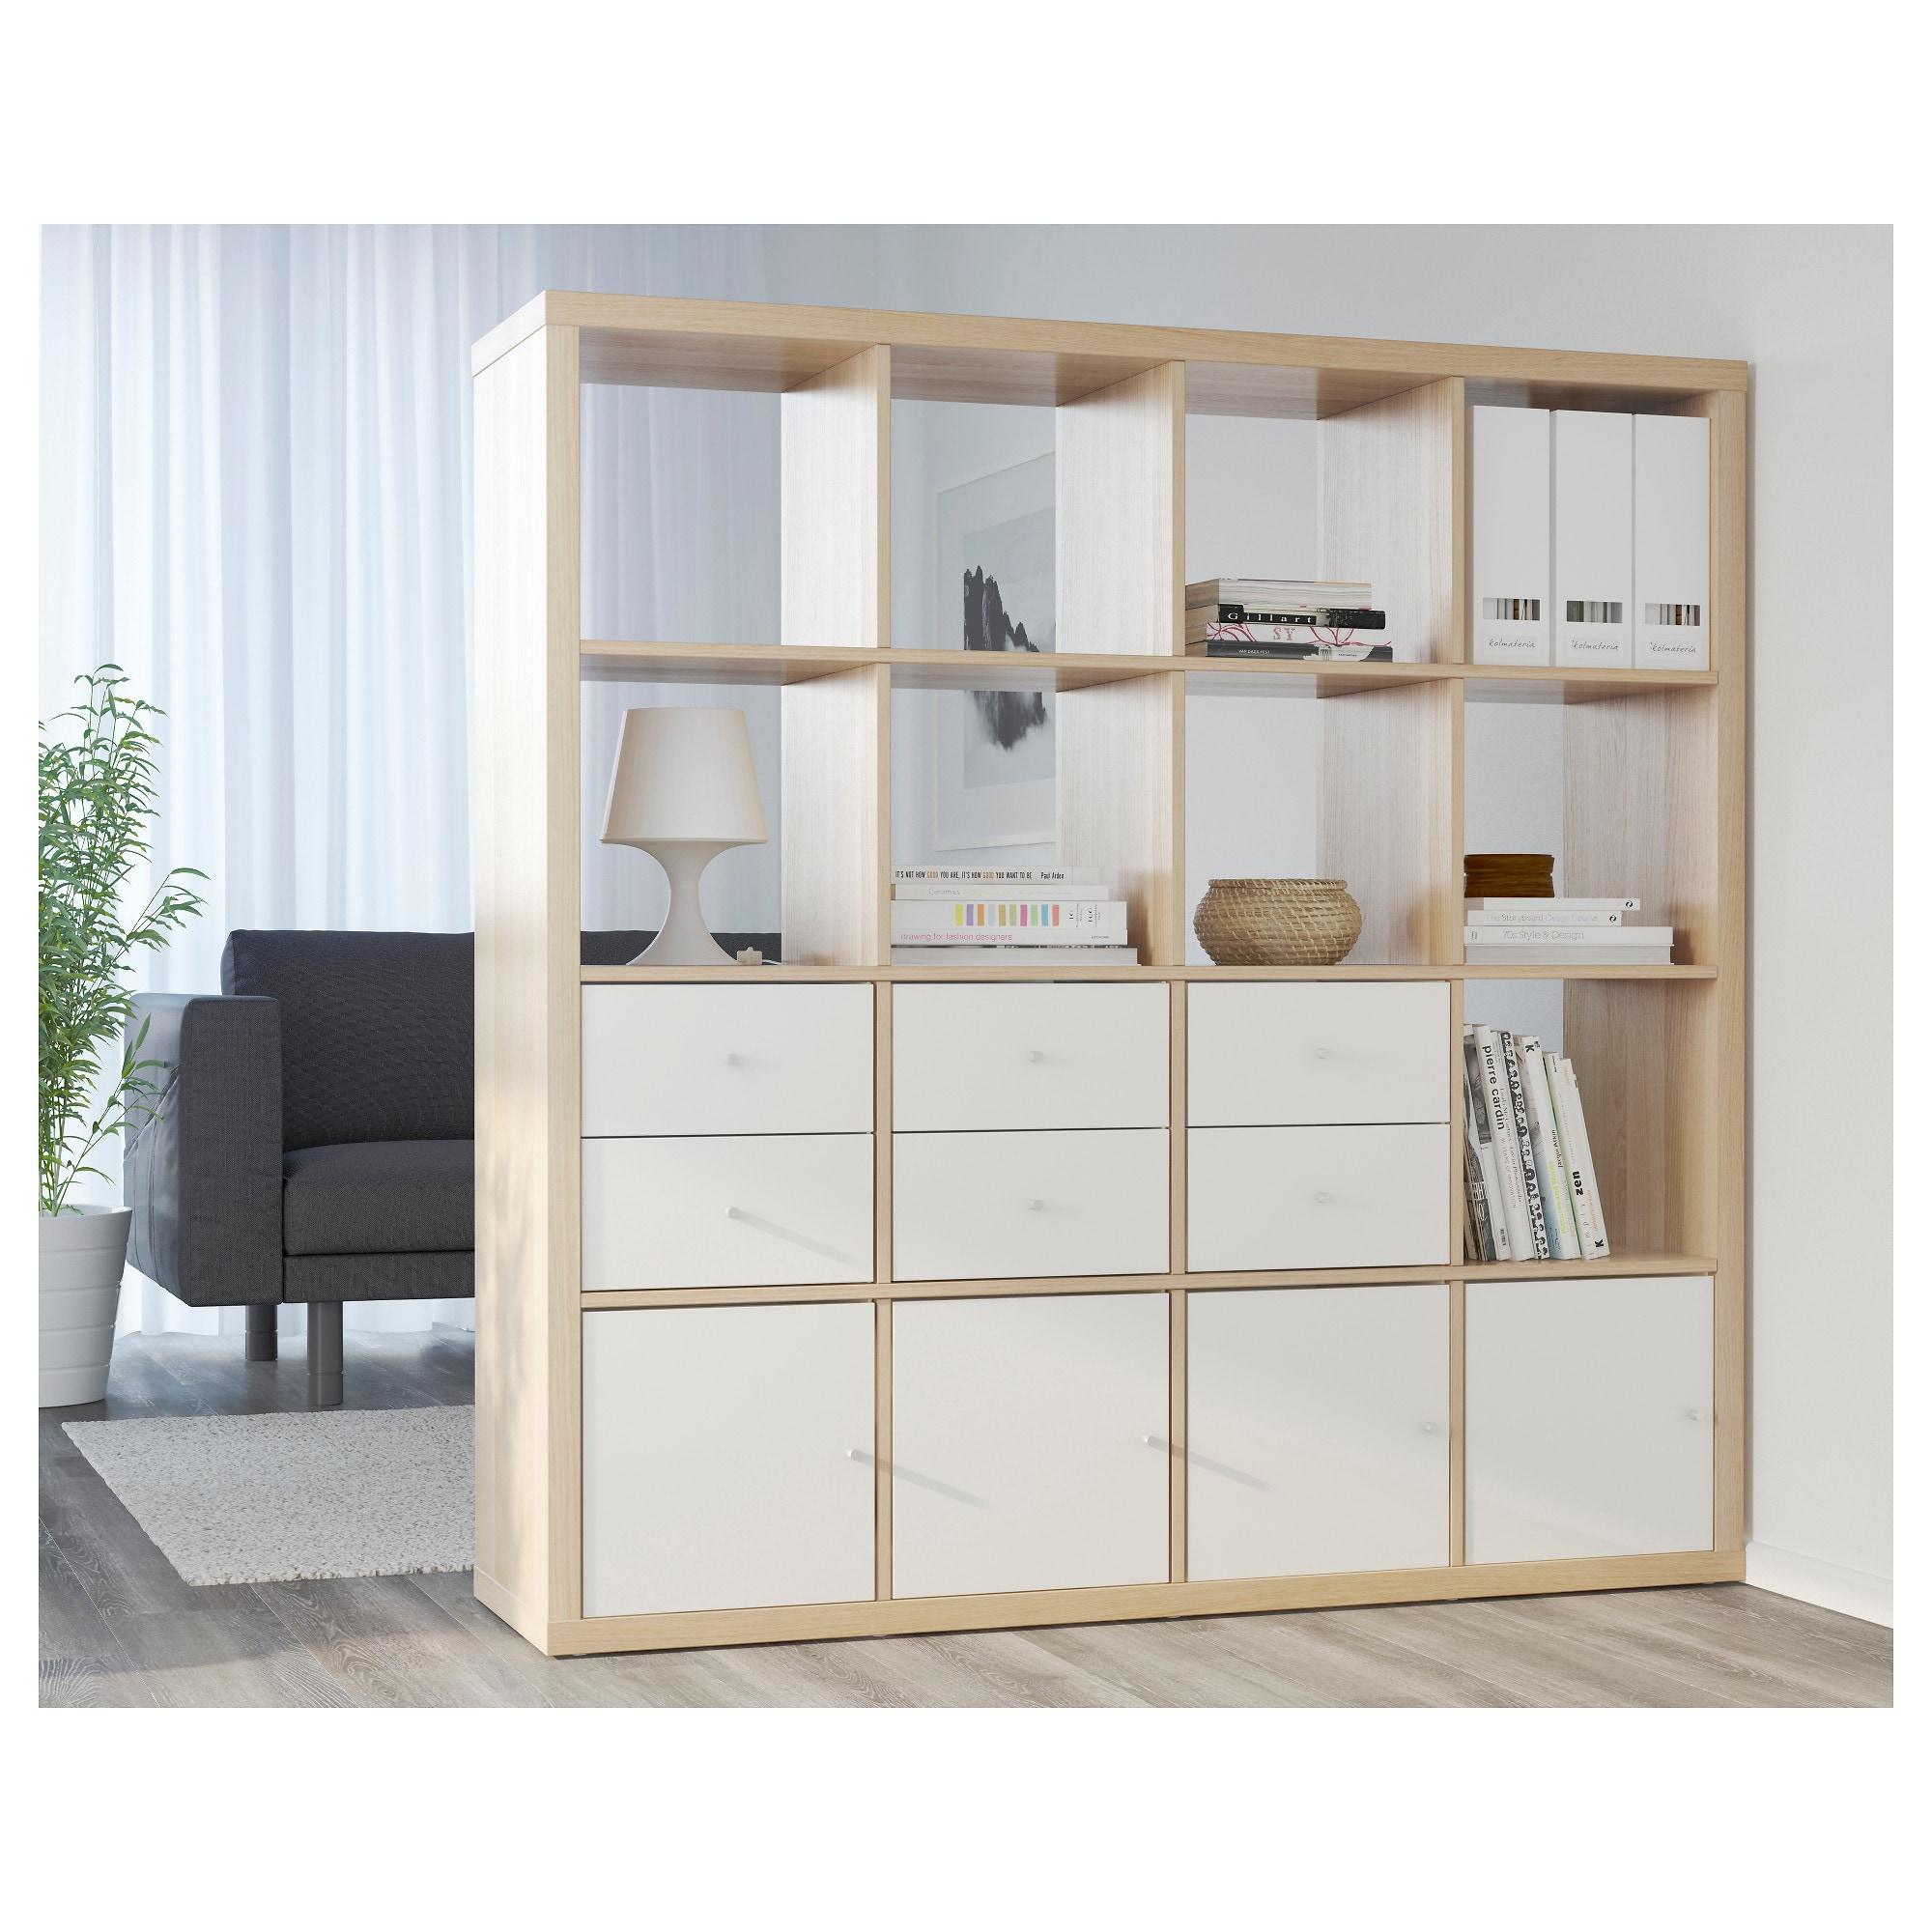 kallax regal, weiß | room divider | pinterest | ikea, room and kallax